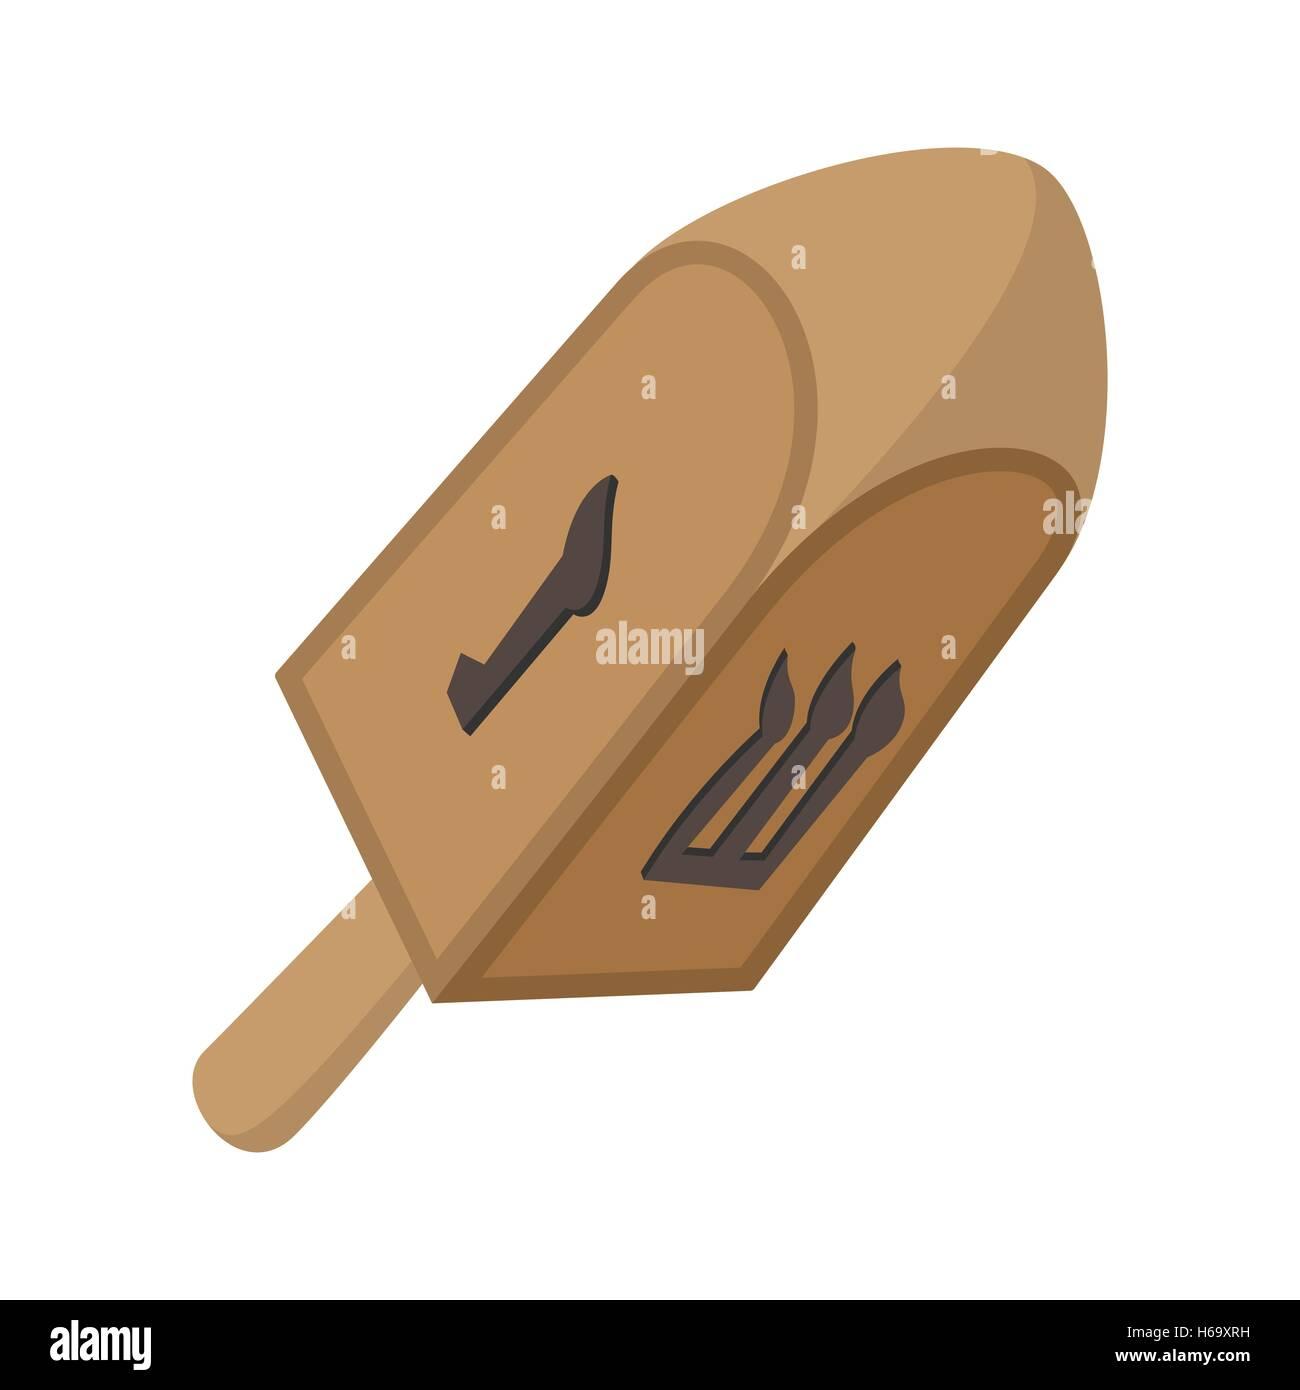 A wooden dreidel cartoon icon - Stock Image